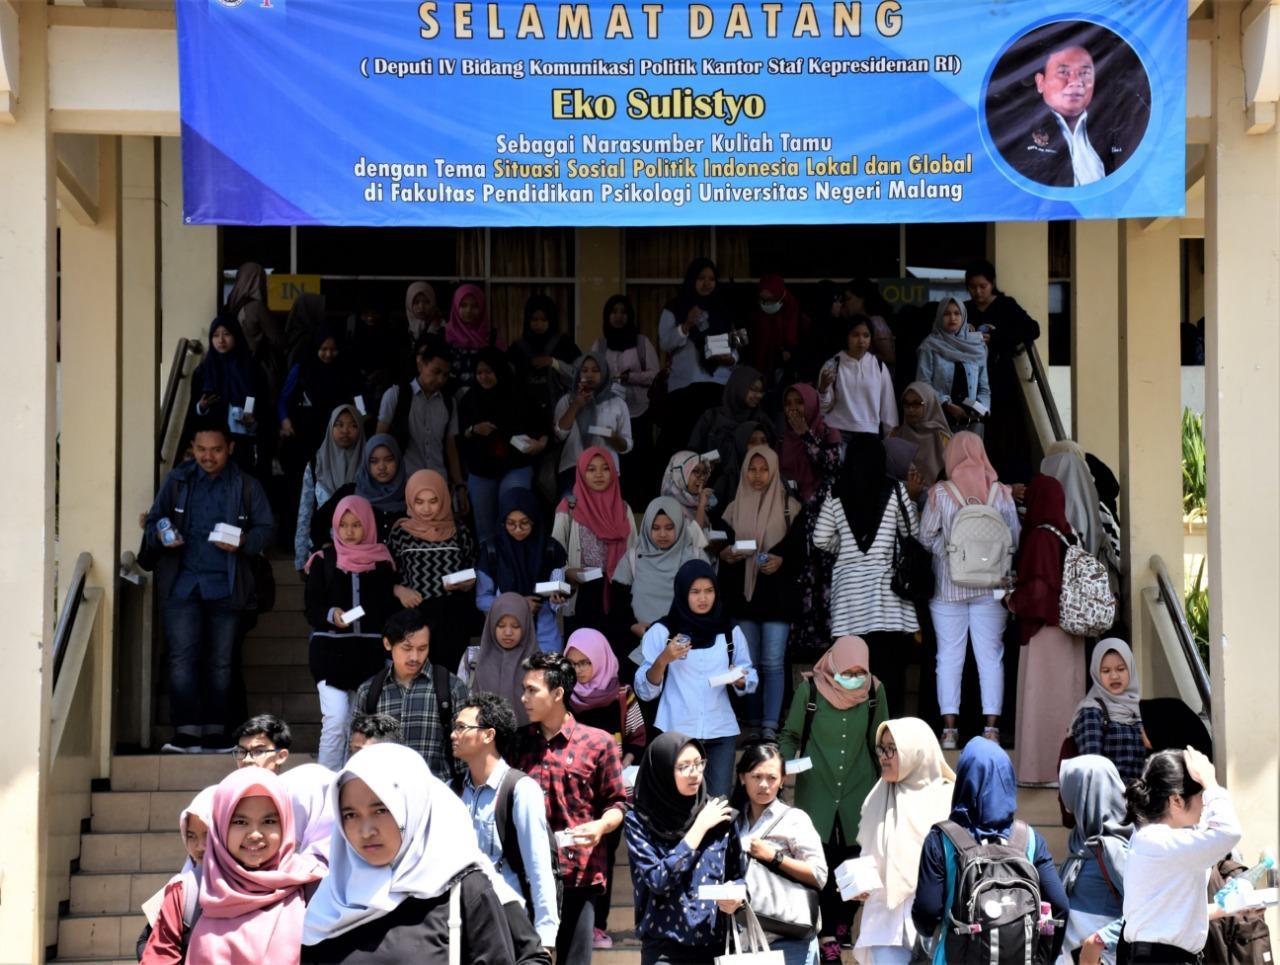 Kematangan Berpolitik dan Berdemokrasi Bangsa Indonesia Sudah Teruji